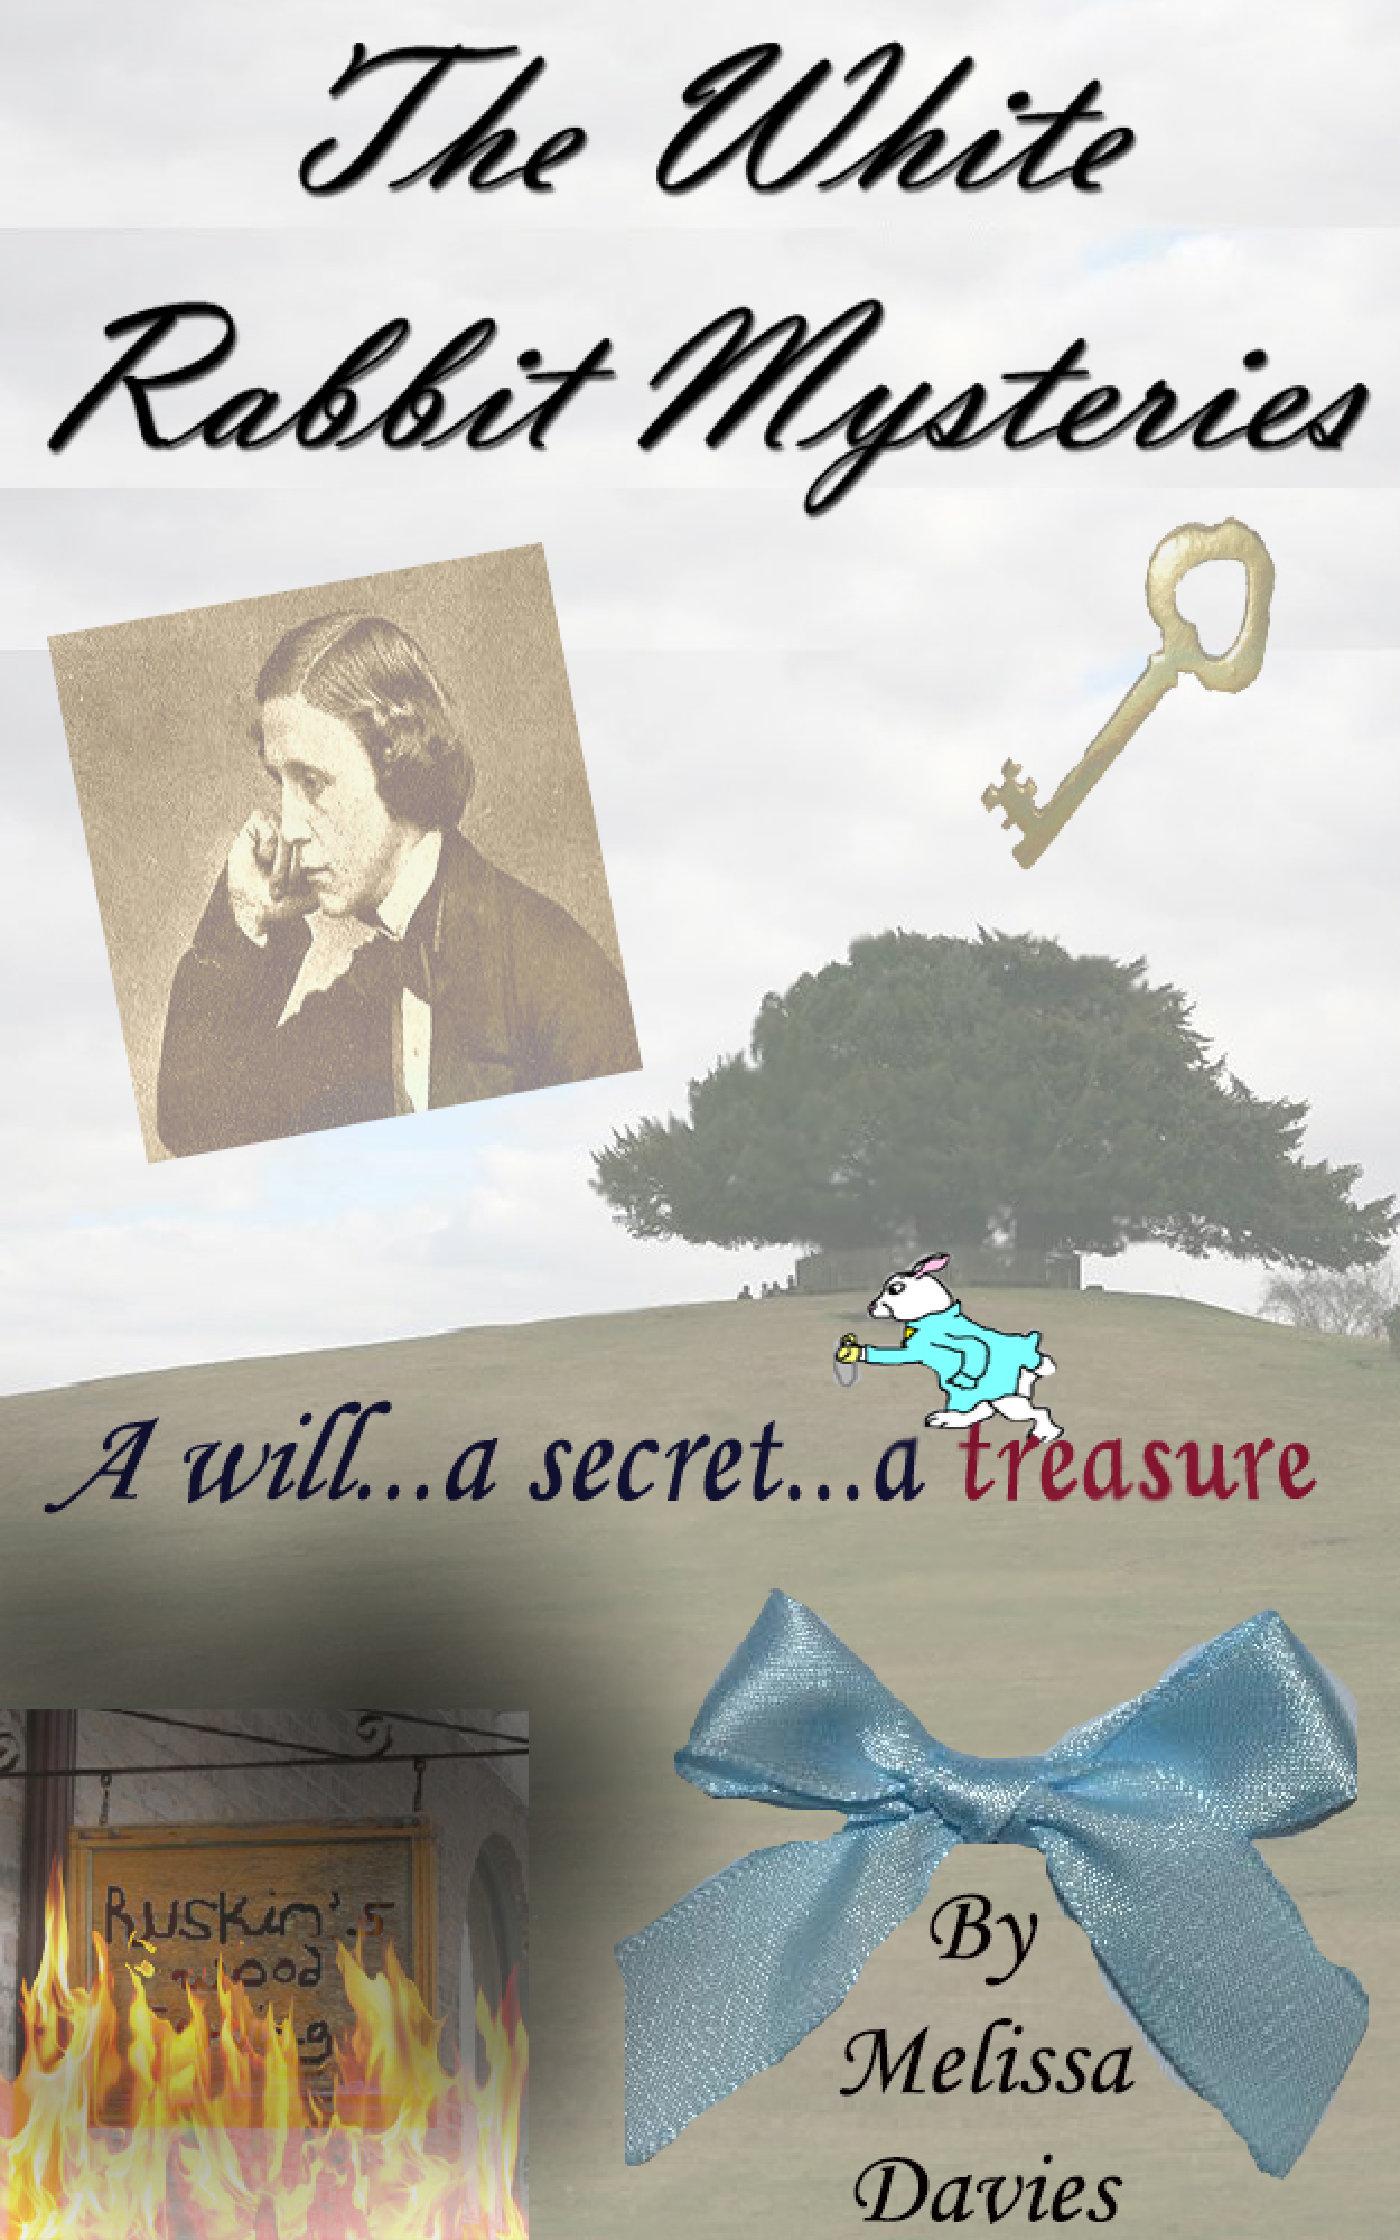 Melissa Davies - The White Rabbit Mysteries